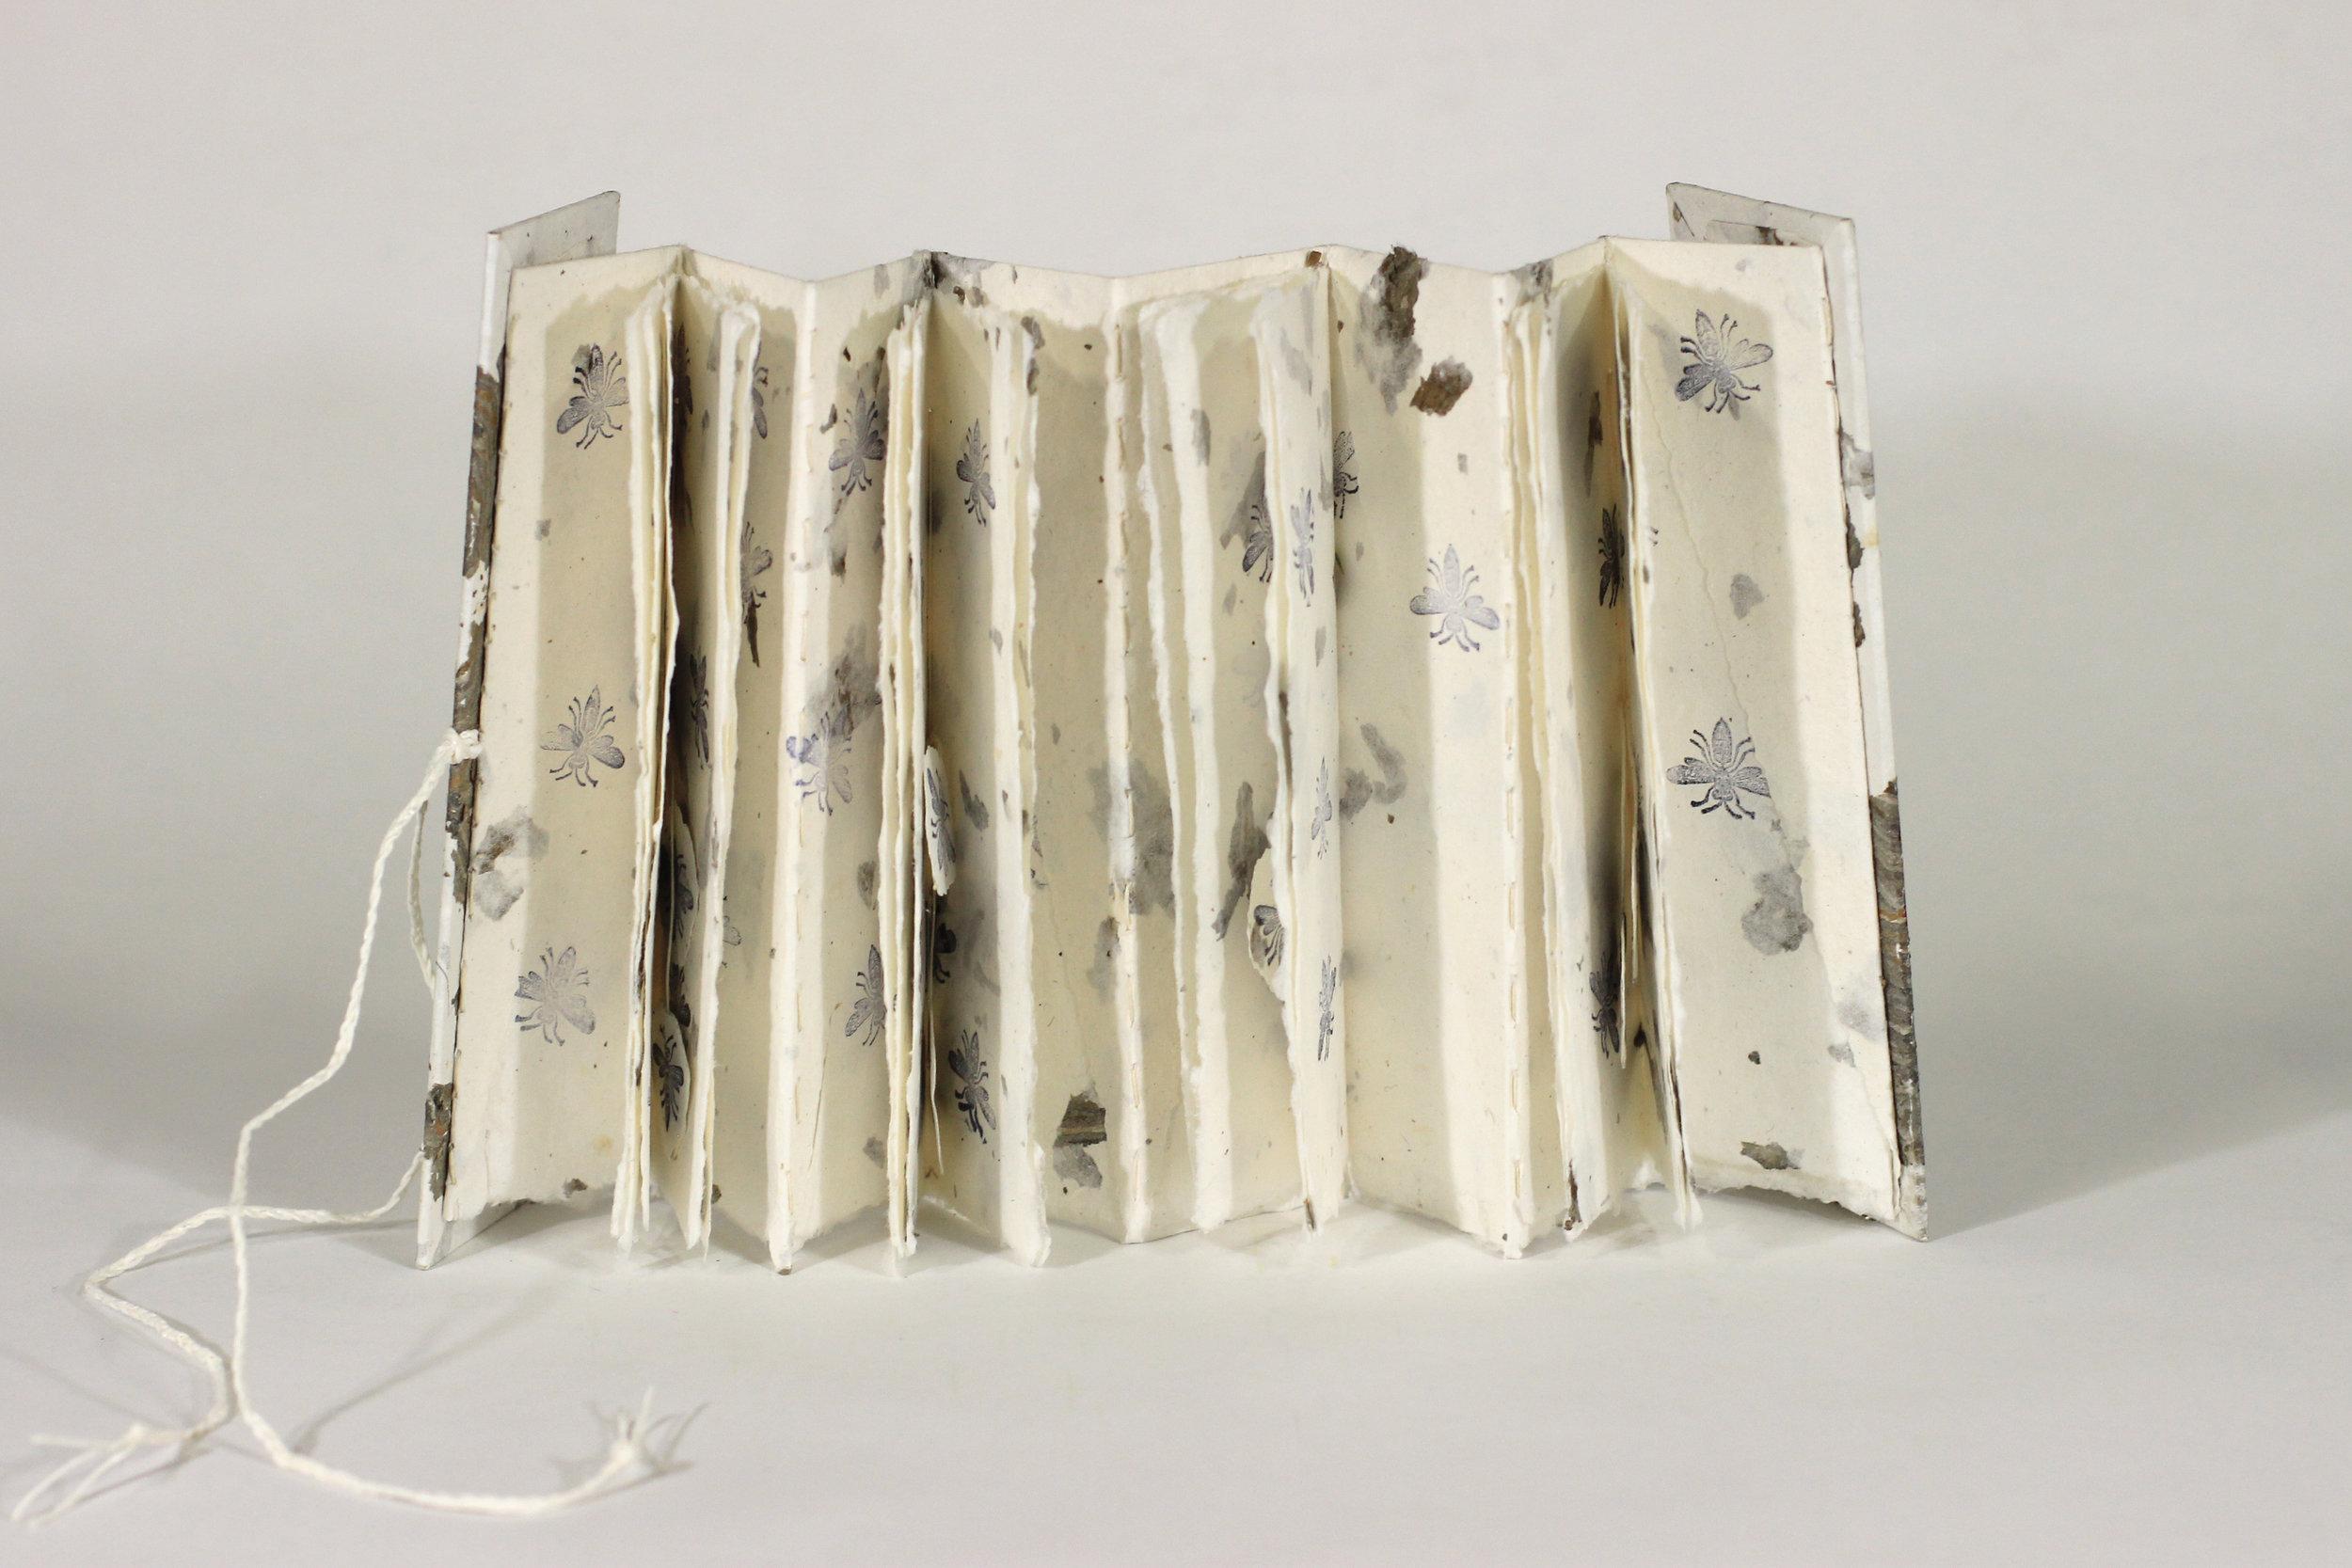 Karen Koykka O\'Neal, Out of Hand Papermaking Studio, Wasps Making Books, Handmade Paper, 2018, $75, Ann Arbor, MI